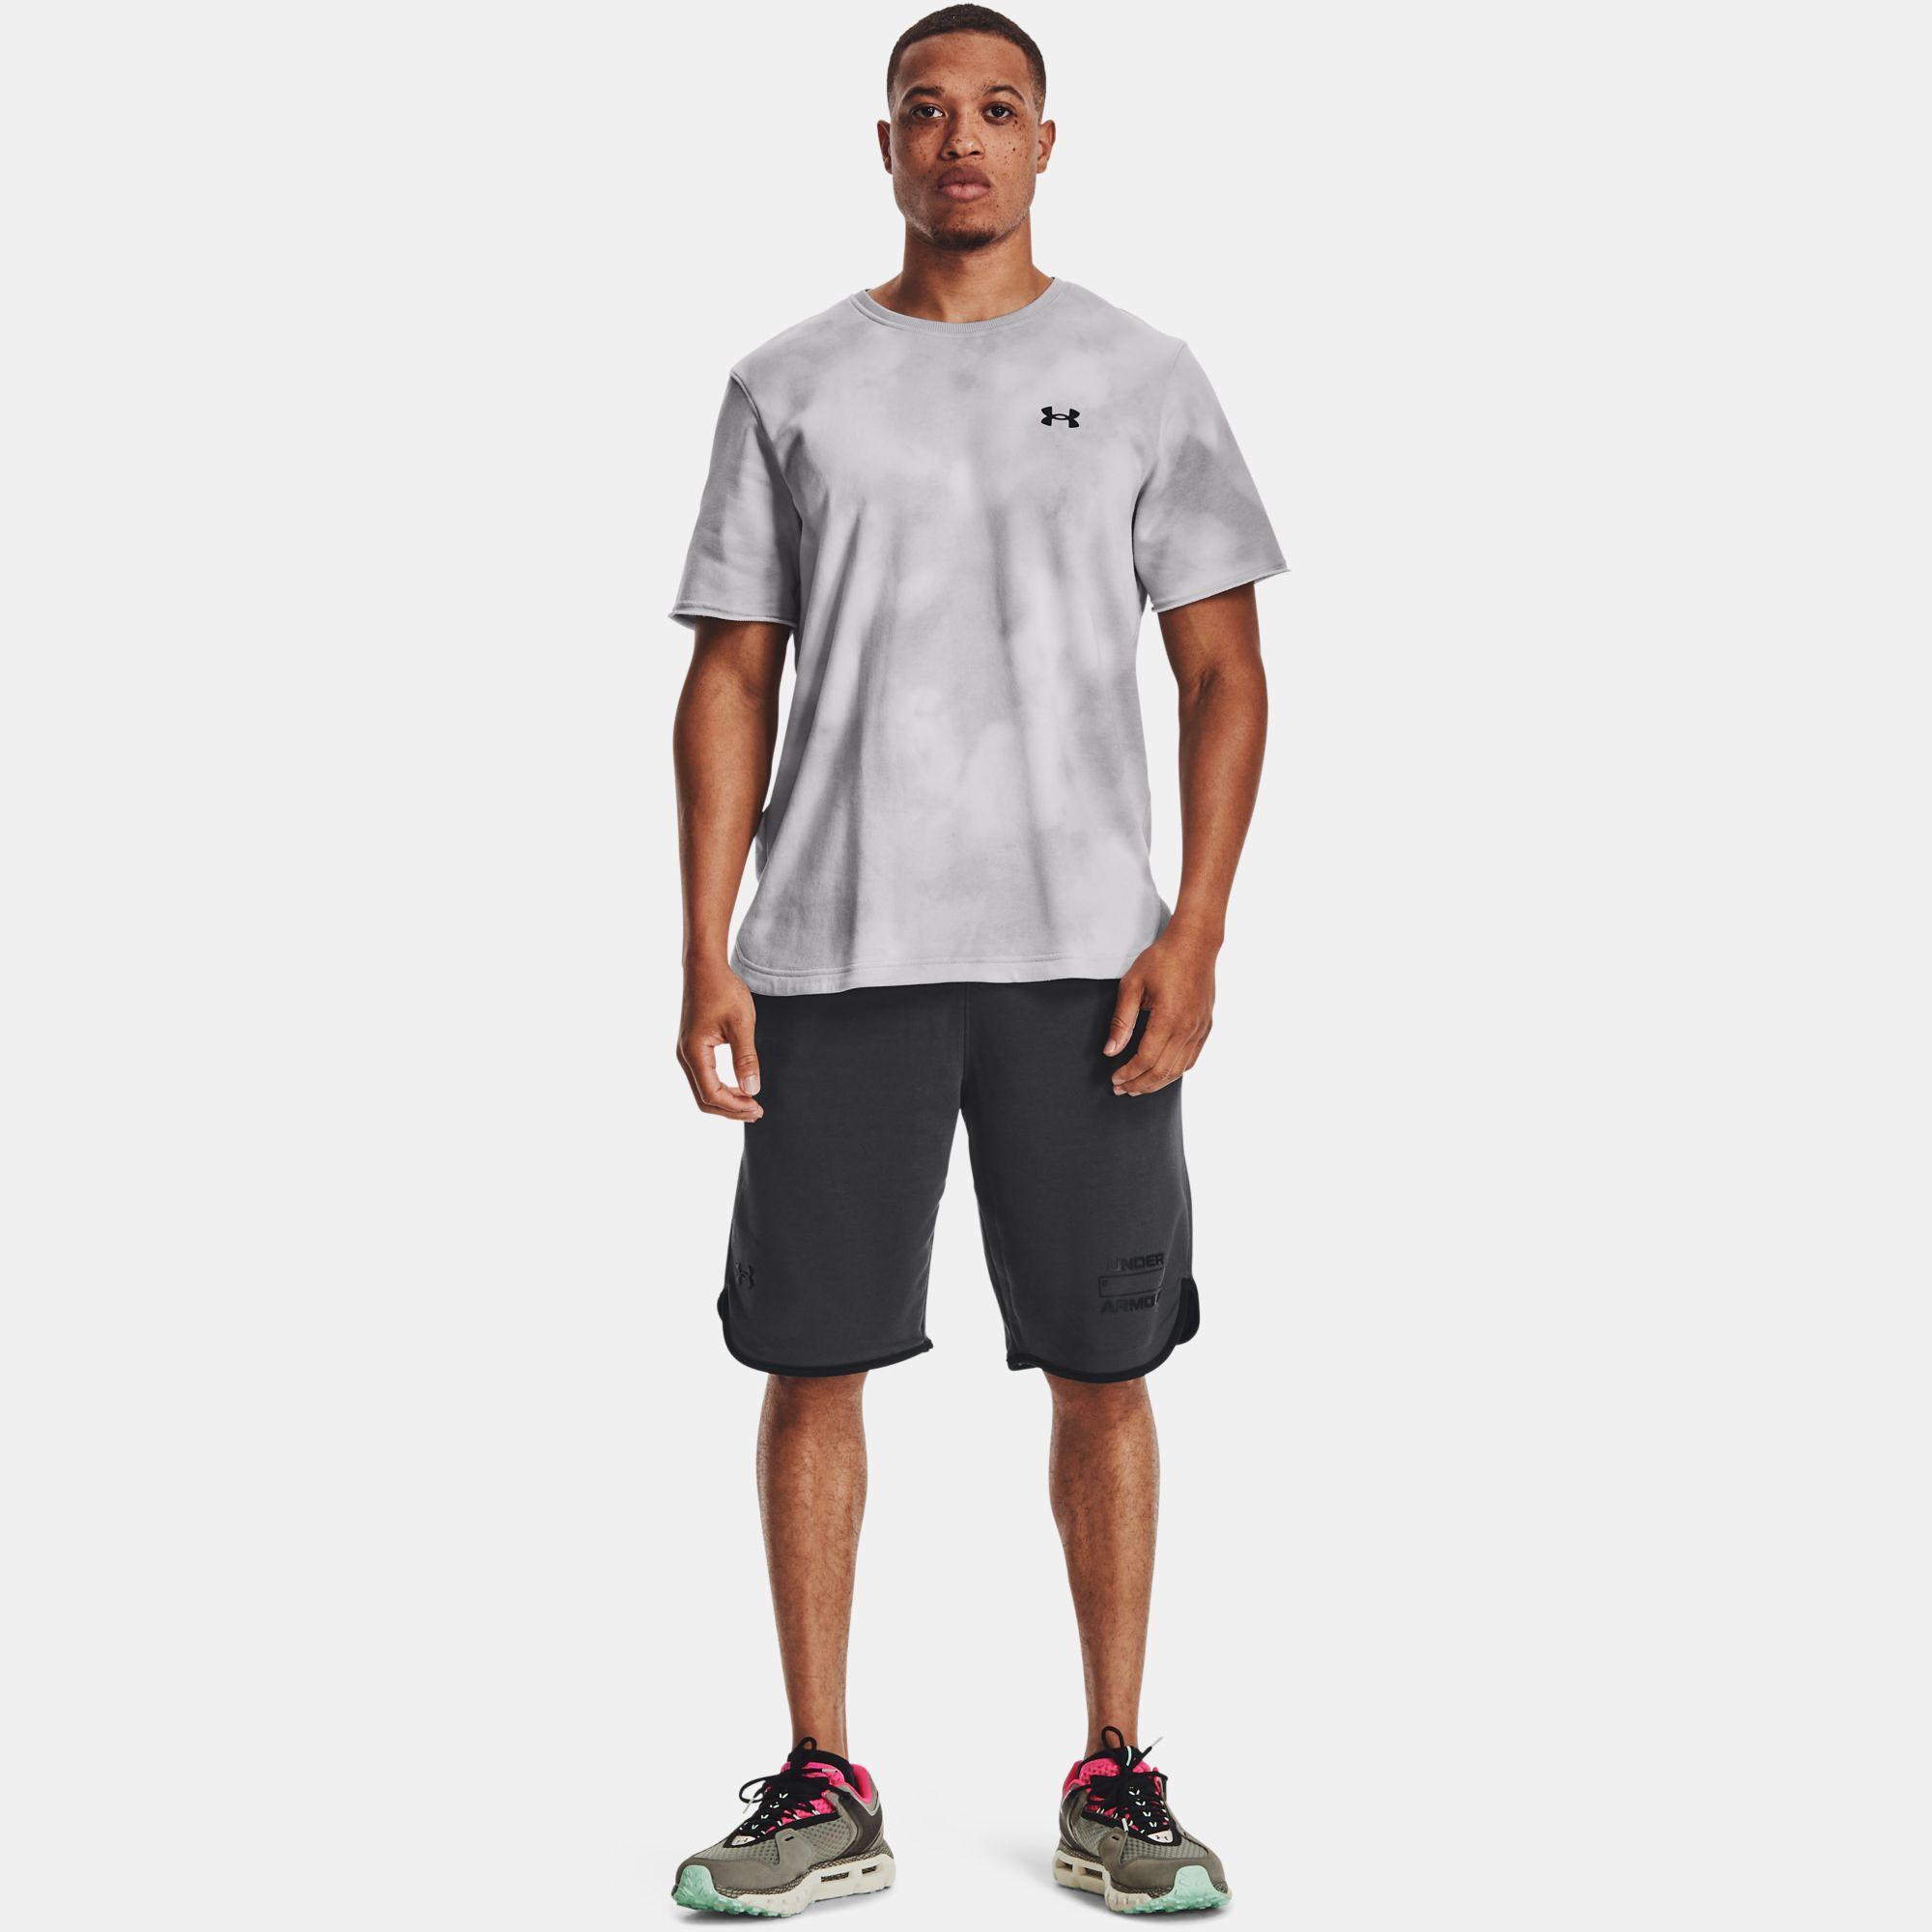 Îmbrăcăminte -  under armour UA Rival Terry Number Shorts